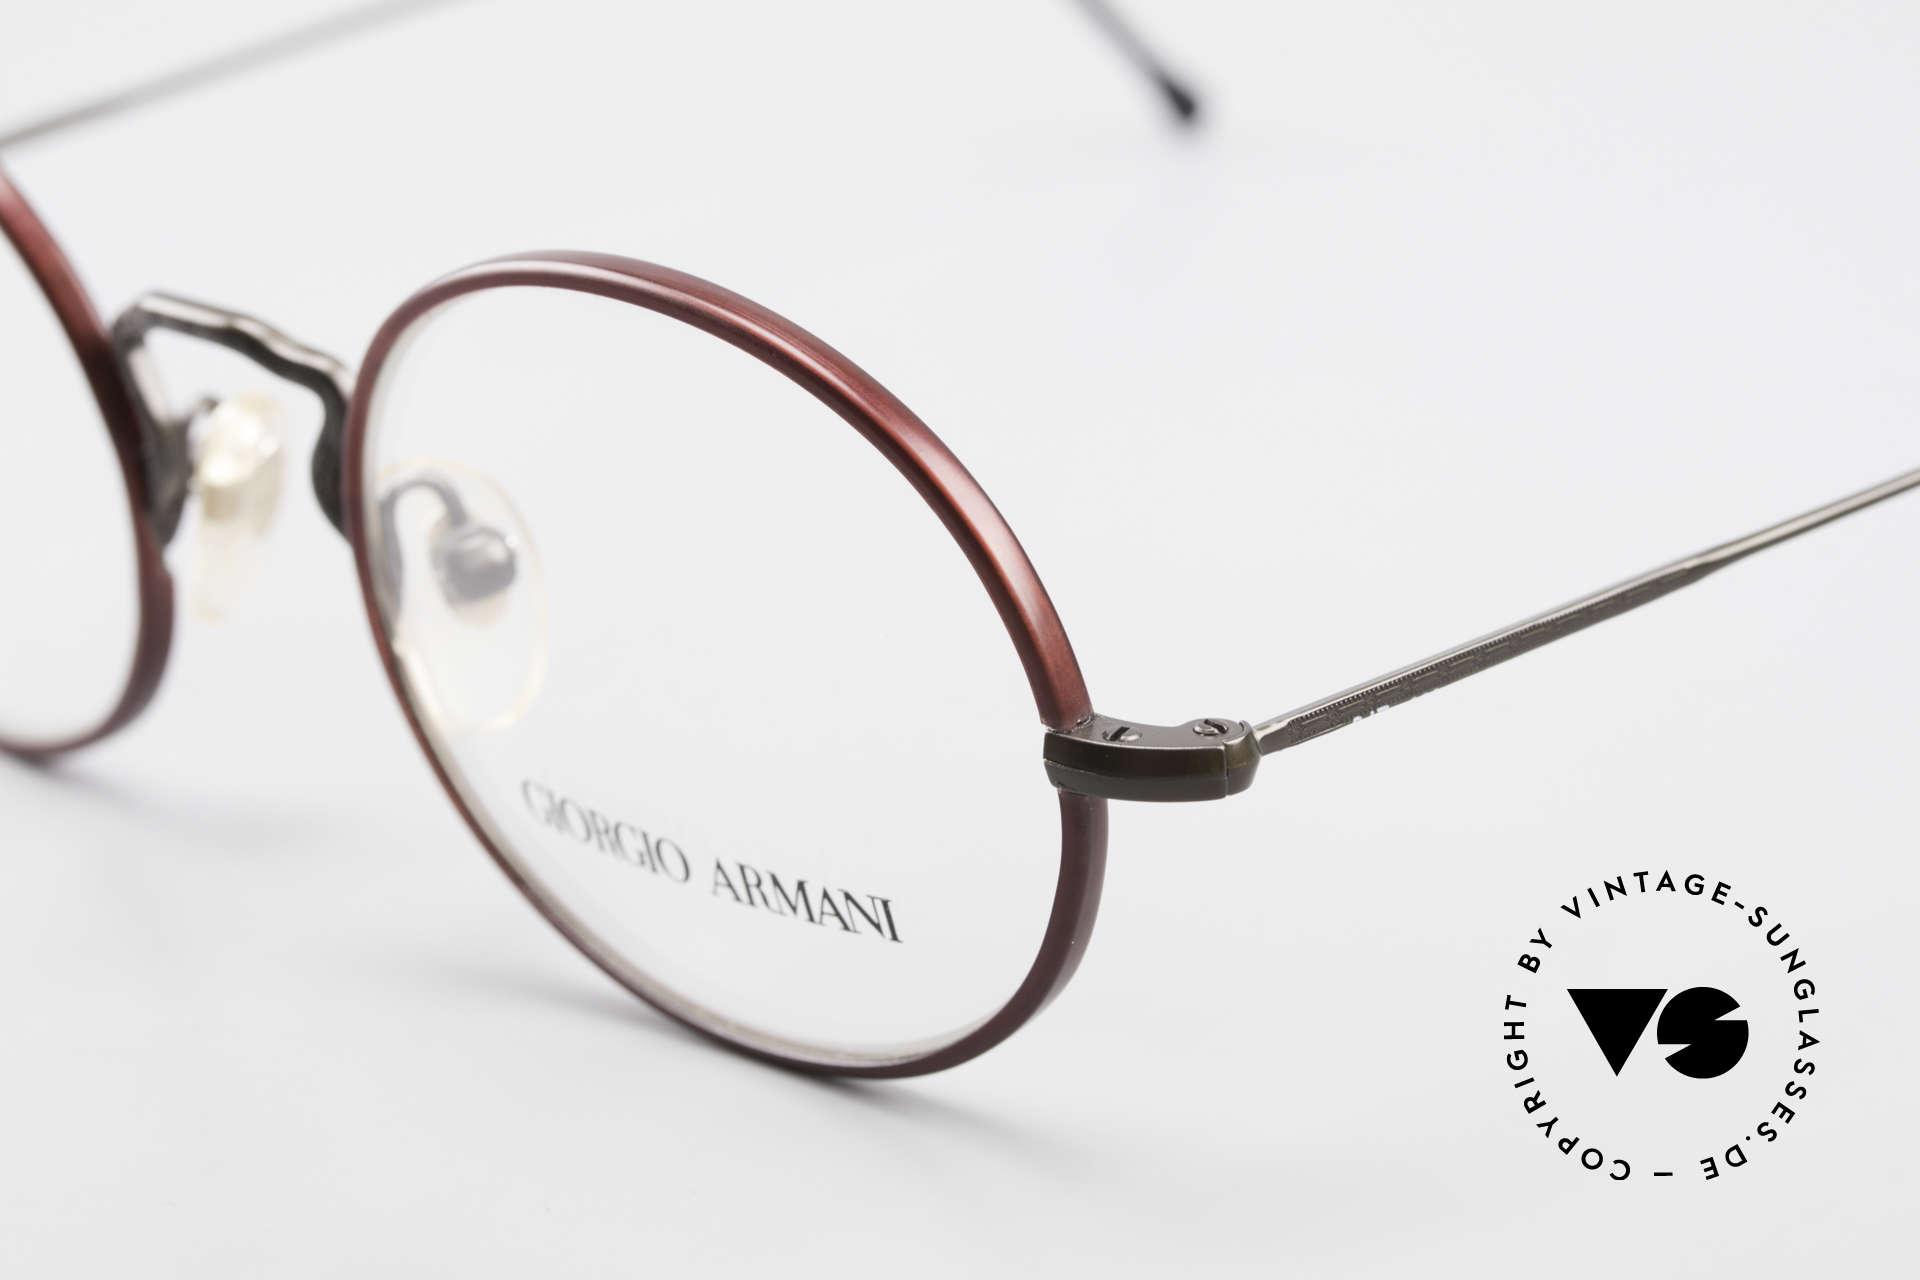 Giorgio Armani 247 Oval 90's Eyeglasses No Retro, unworn rarity (like all our rare vintage GA eyewear), Made for Men and Women